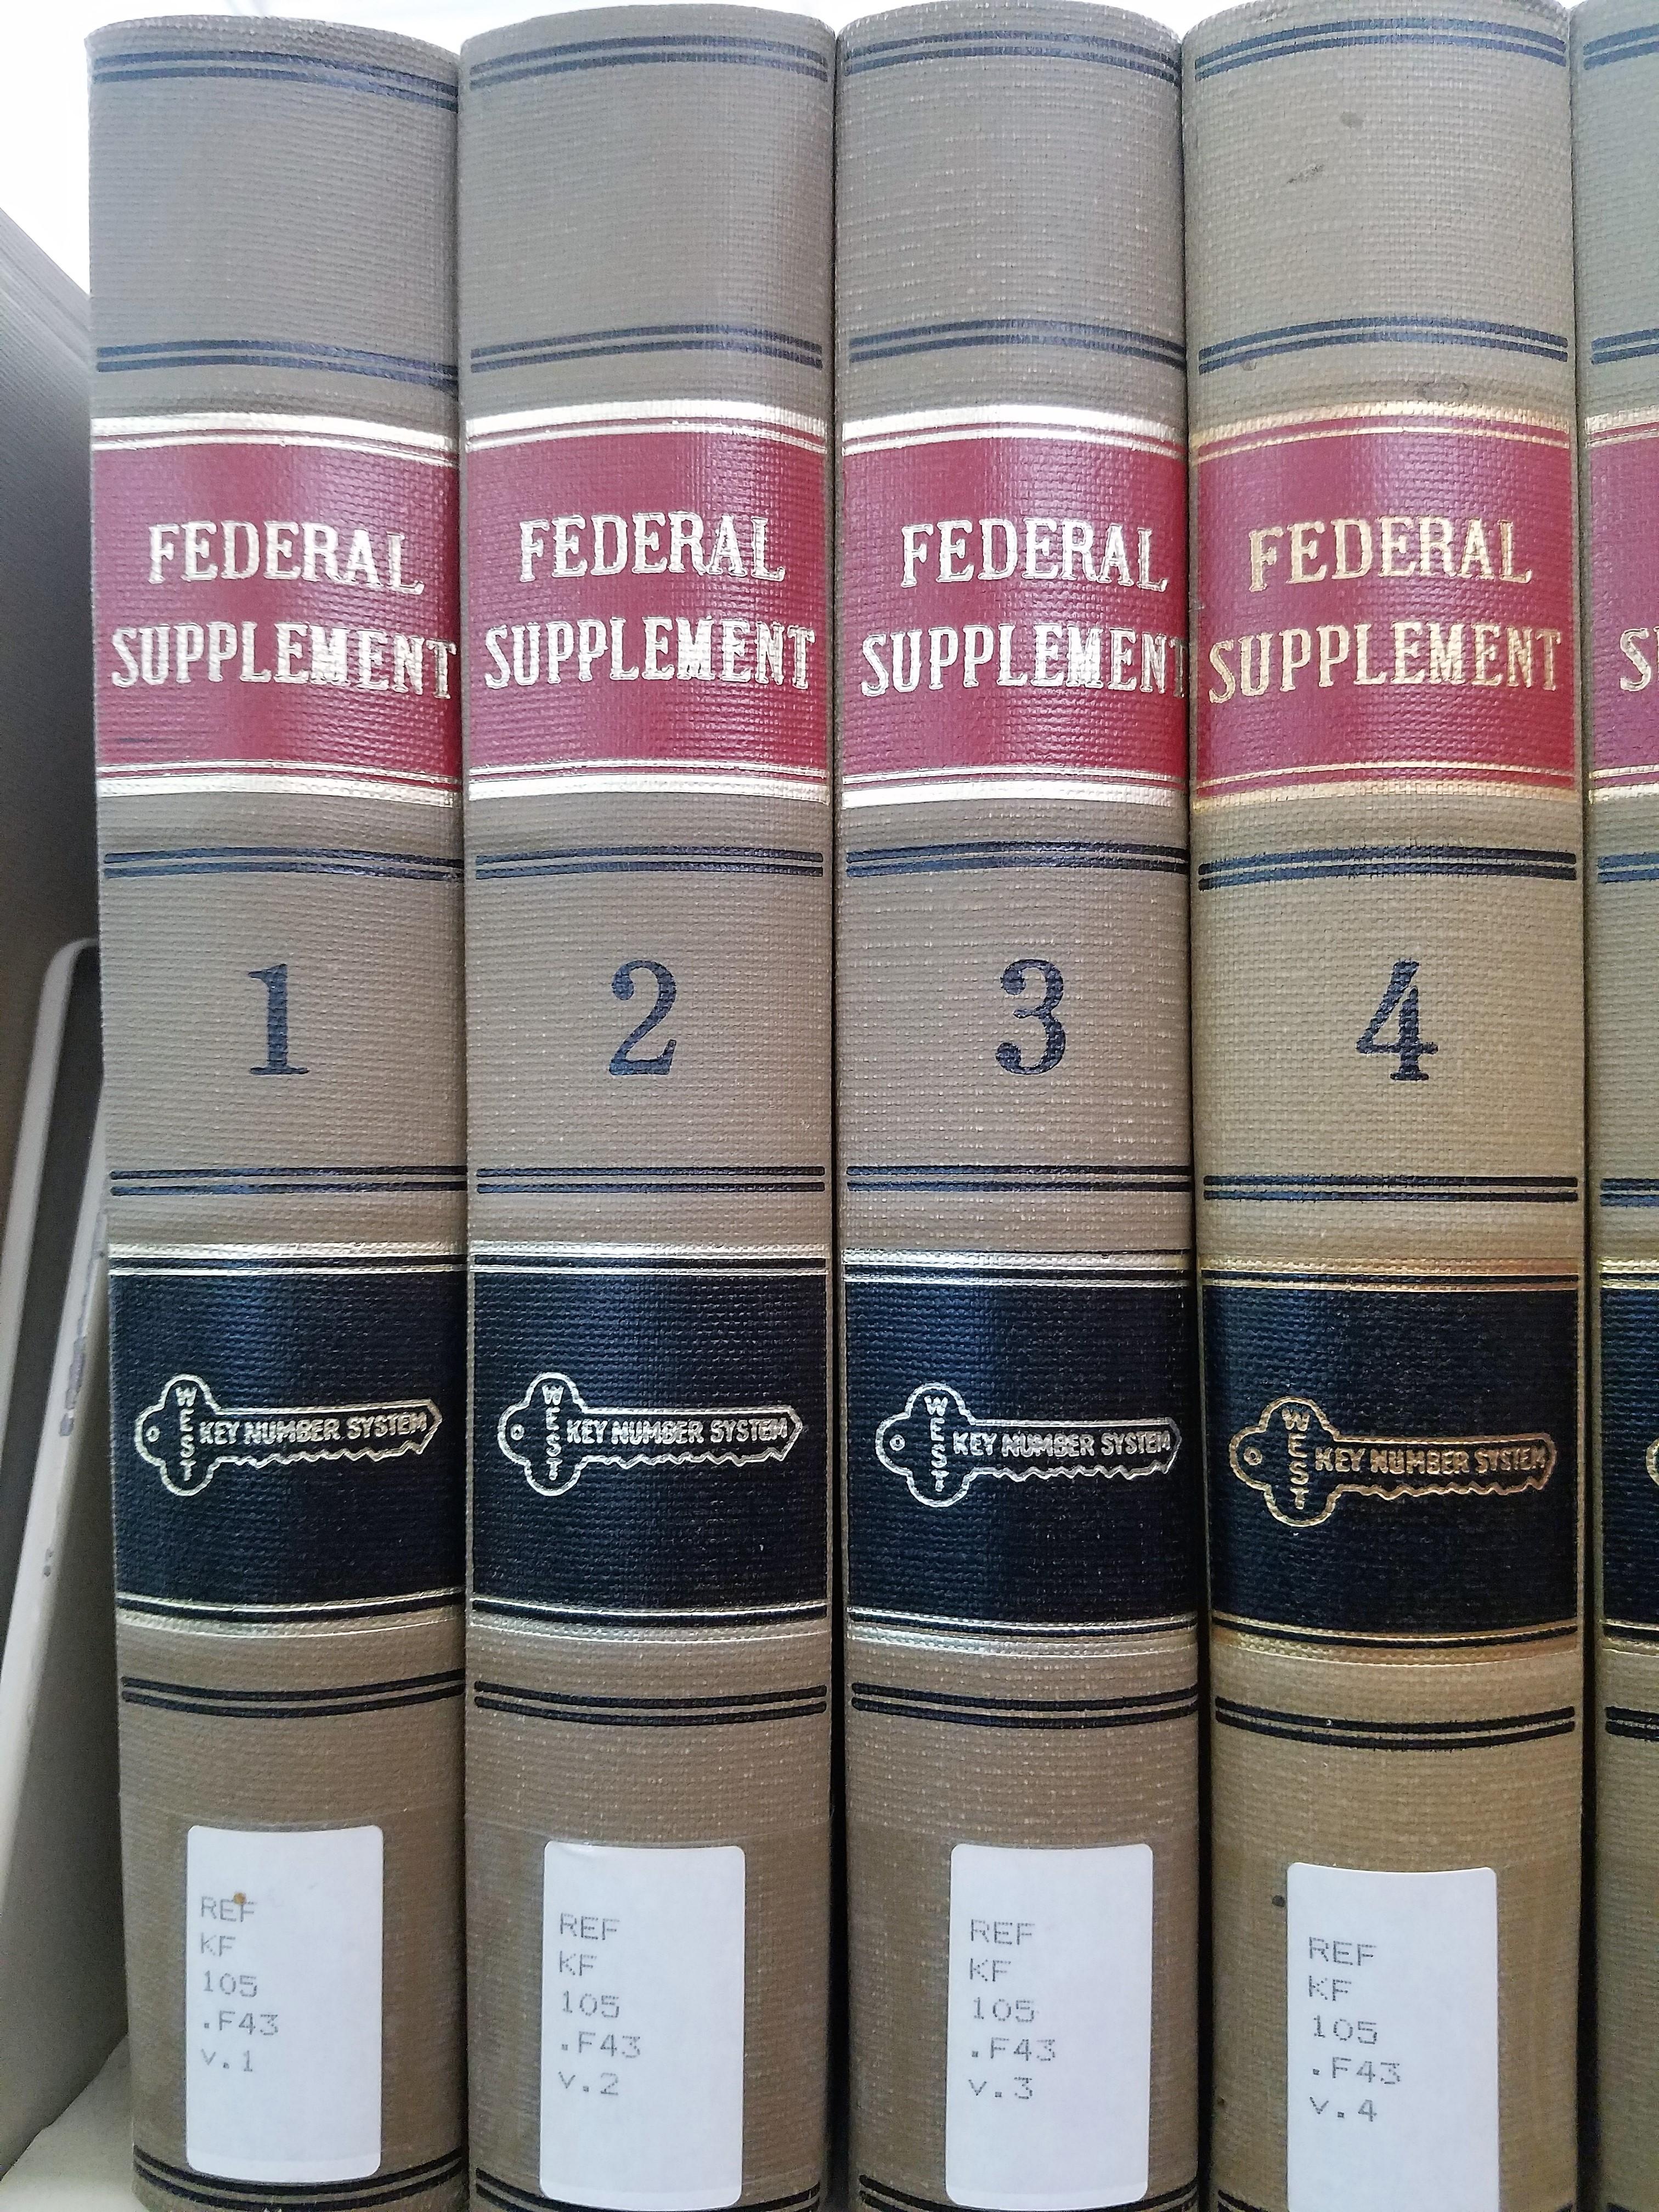 Federal Supplement